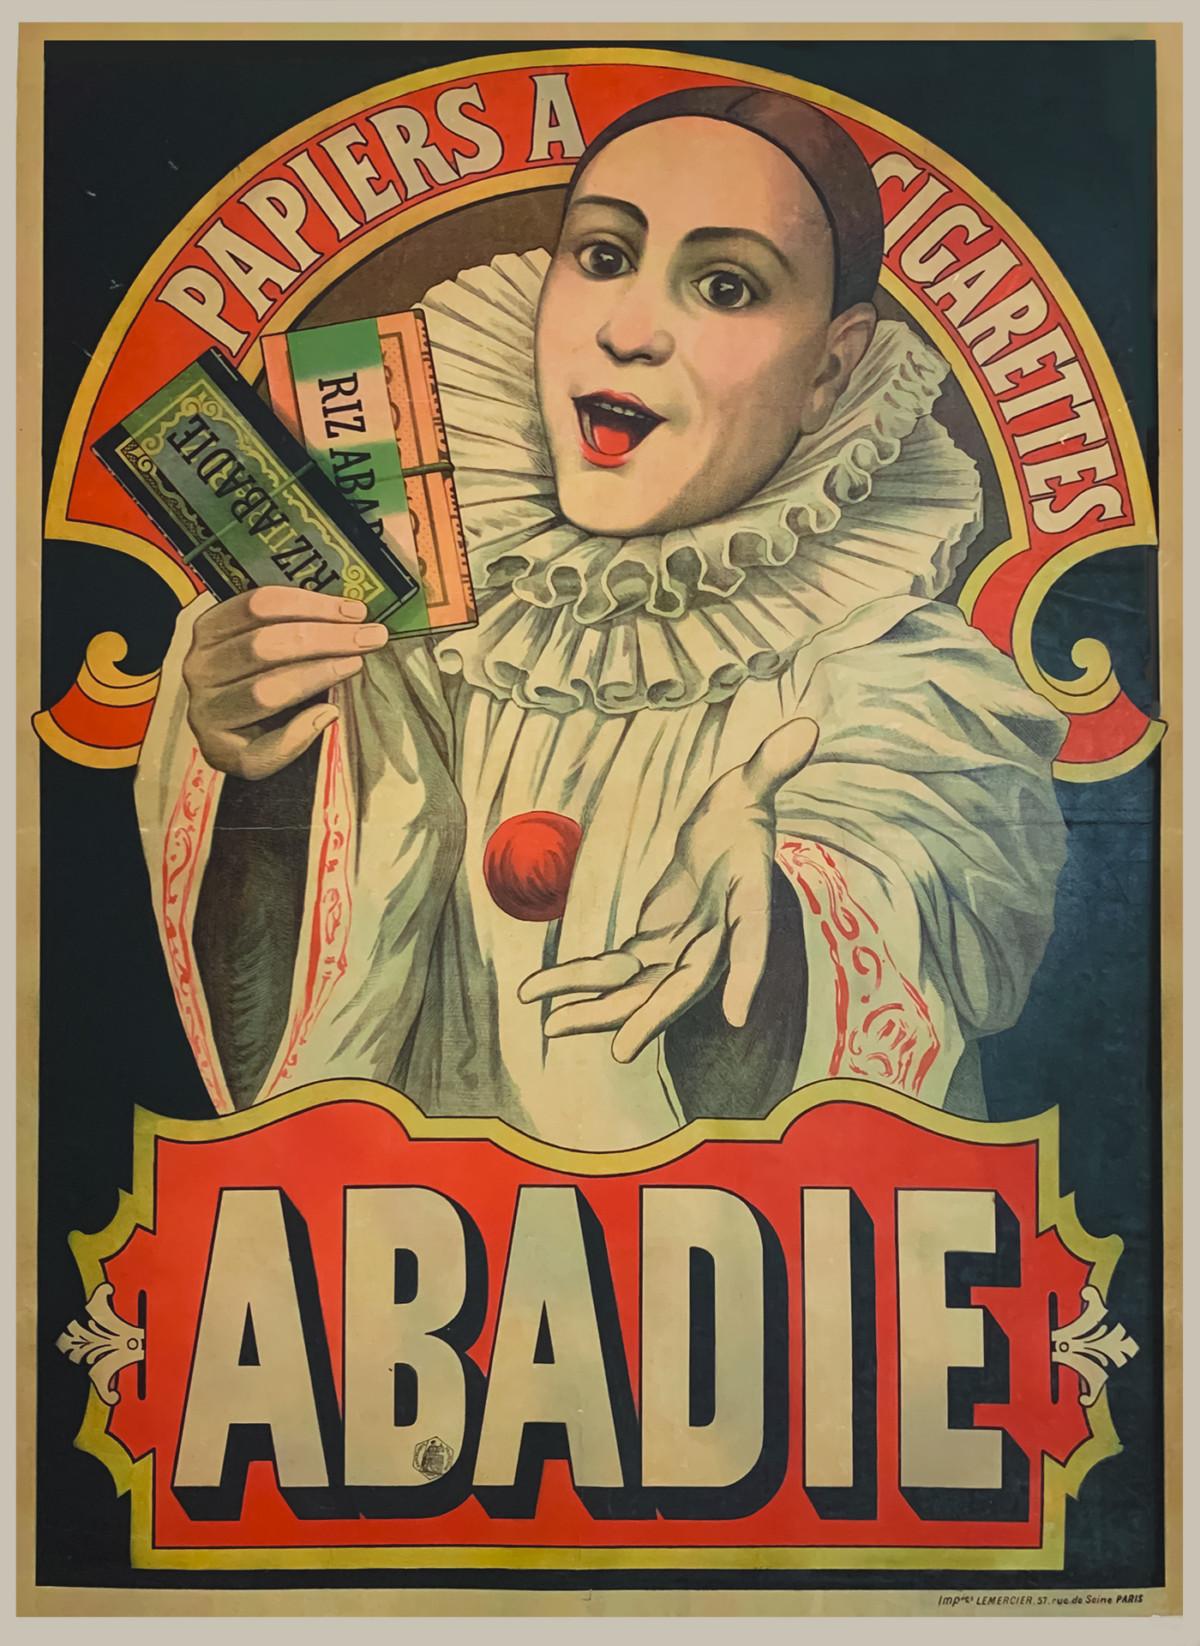 Artist unknown for Abadie 1895.